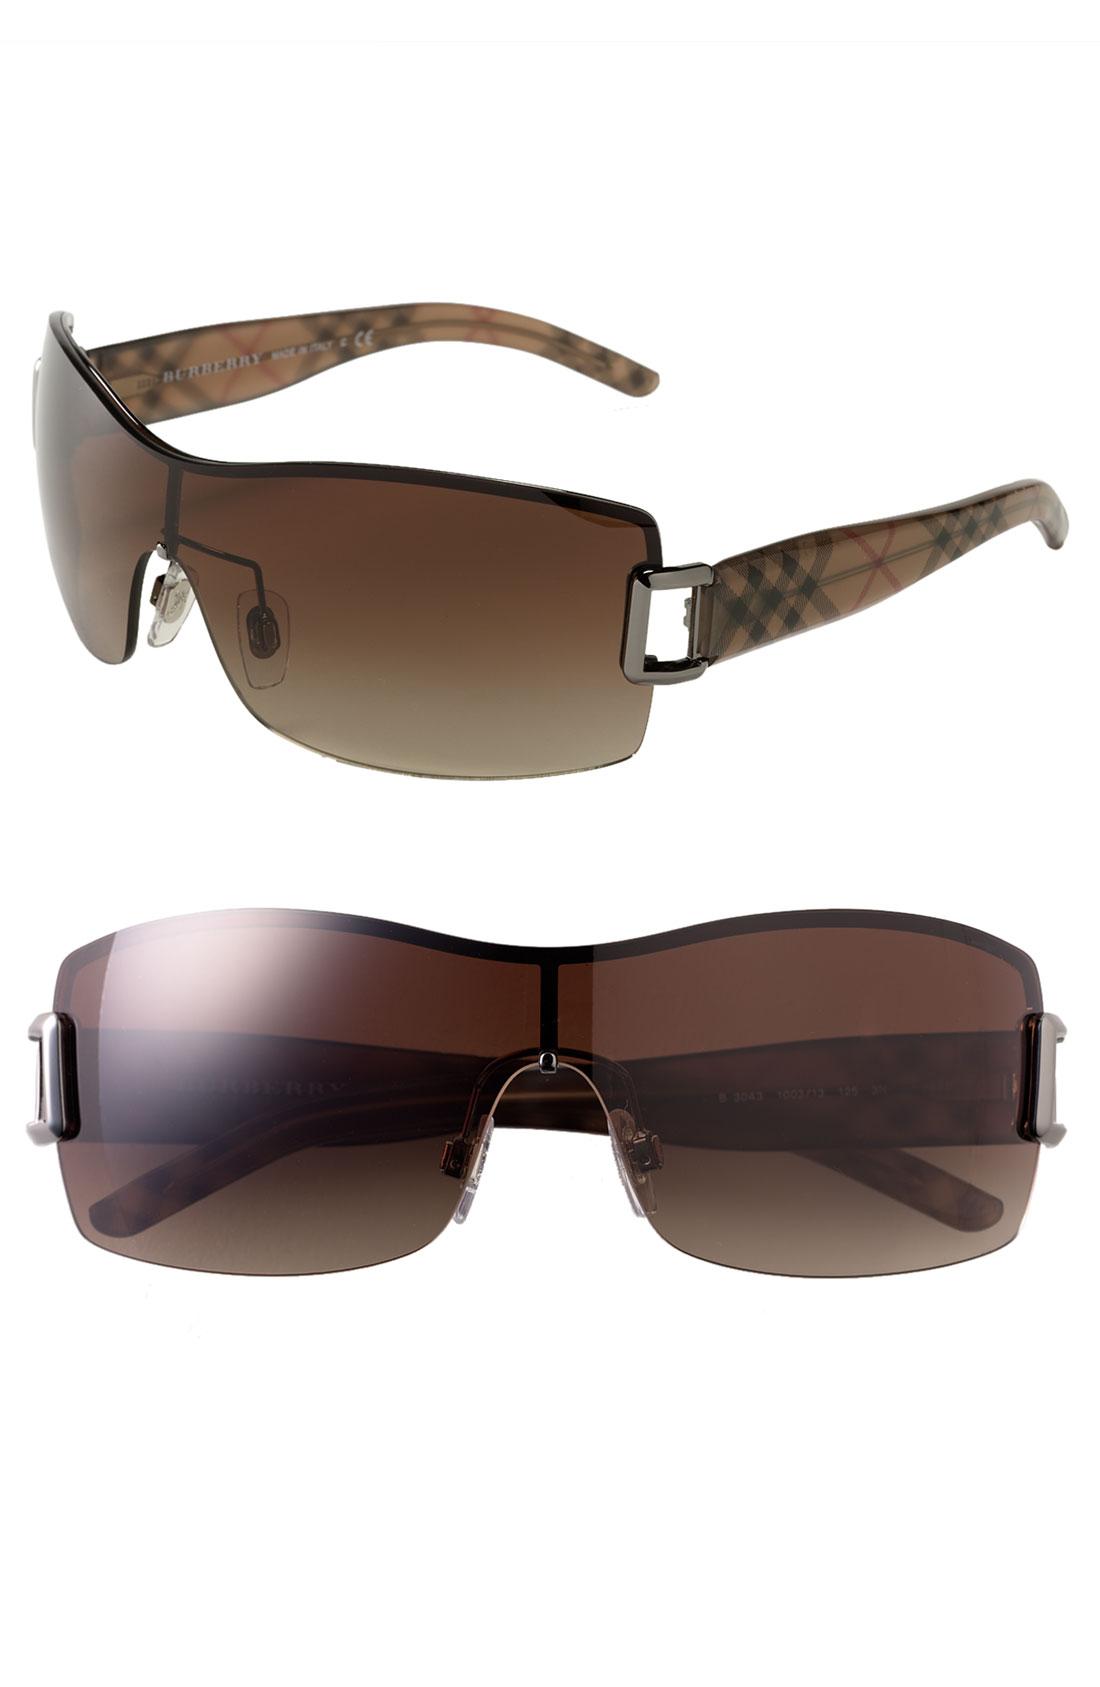 Burberry Rimless Glasses : Burberry Check Print Rimless Shield Sunglasses in Brown ...